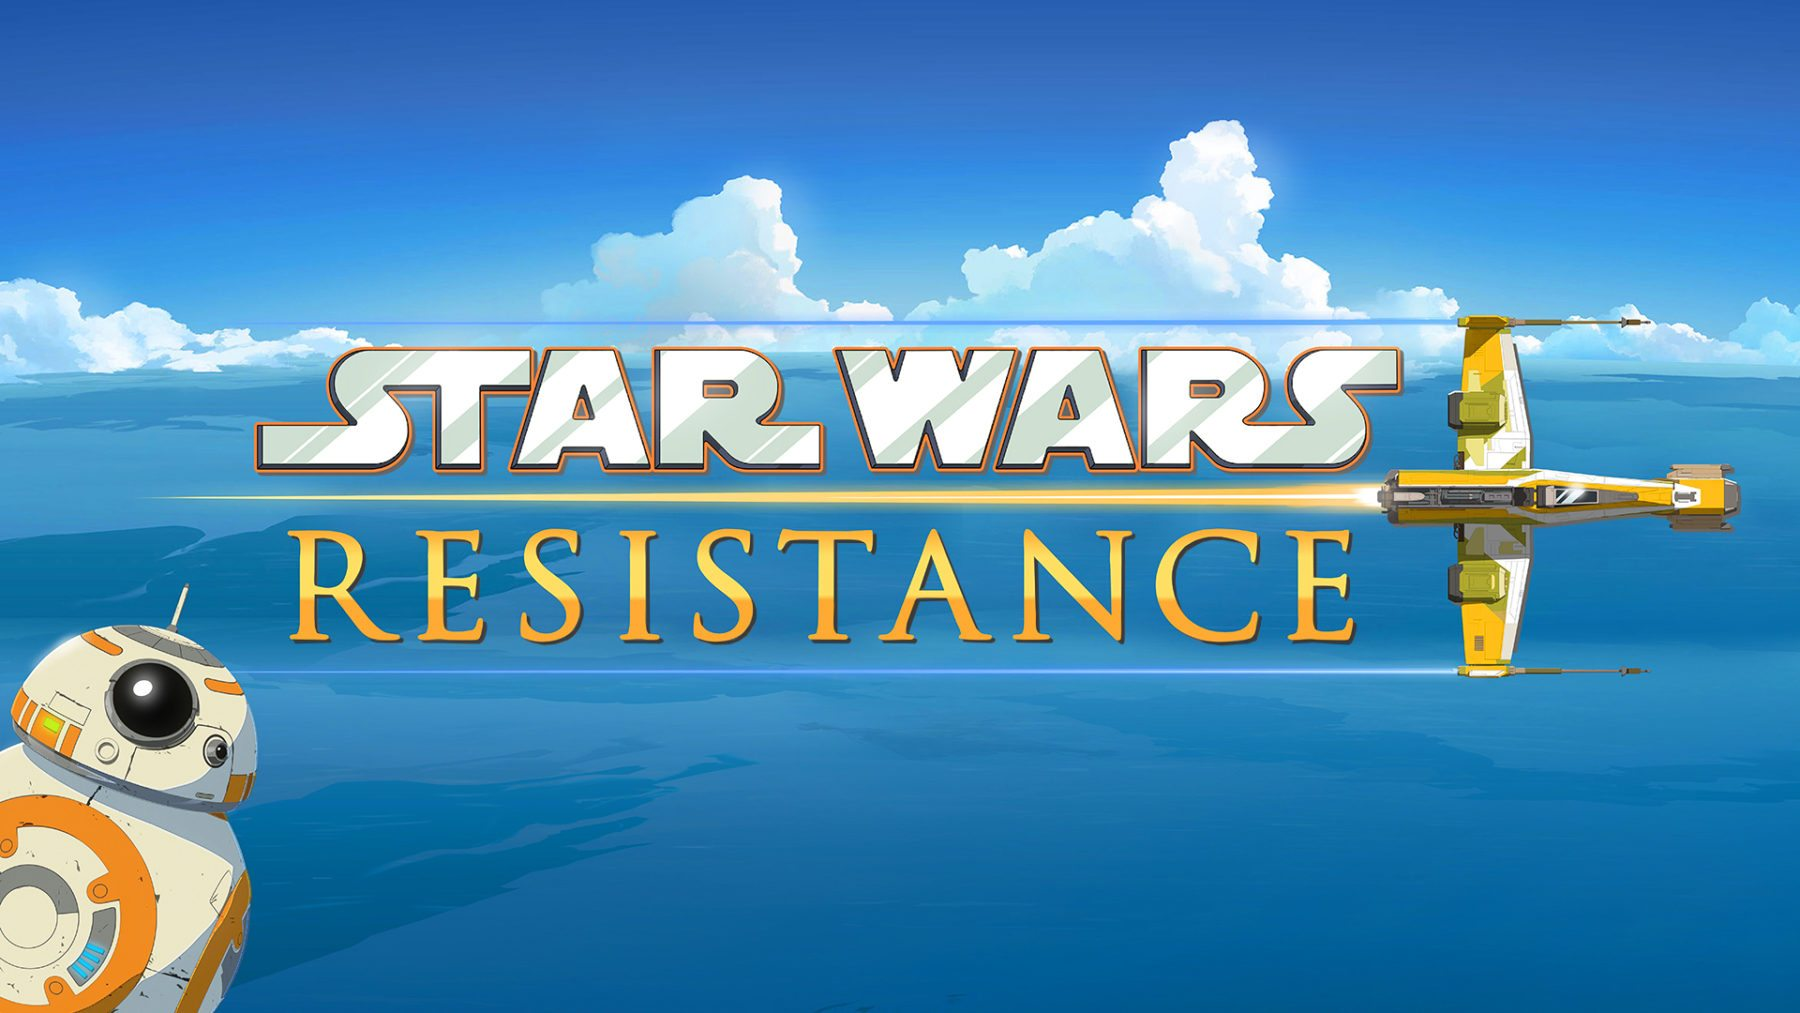 Star Wars Resistance obtiene un avance extendido